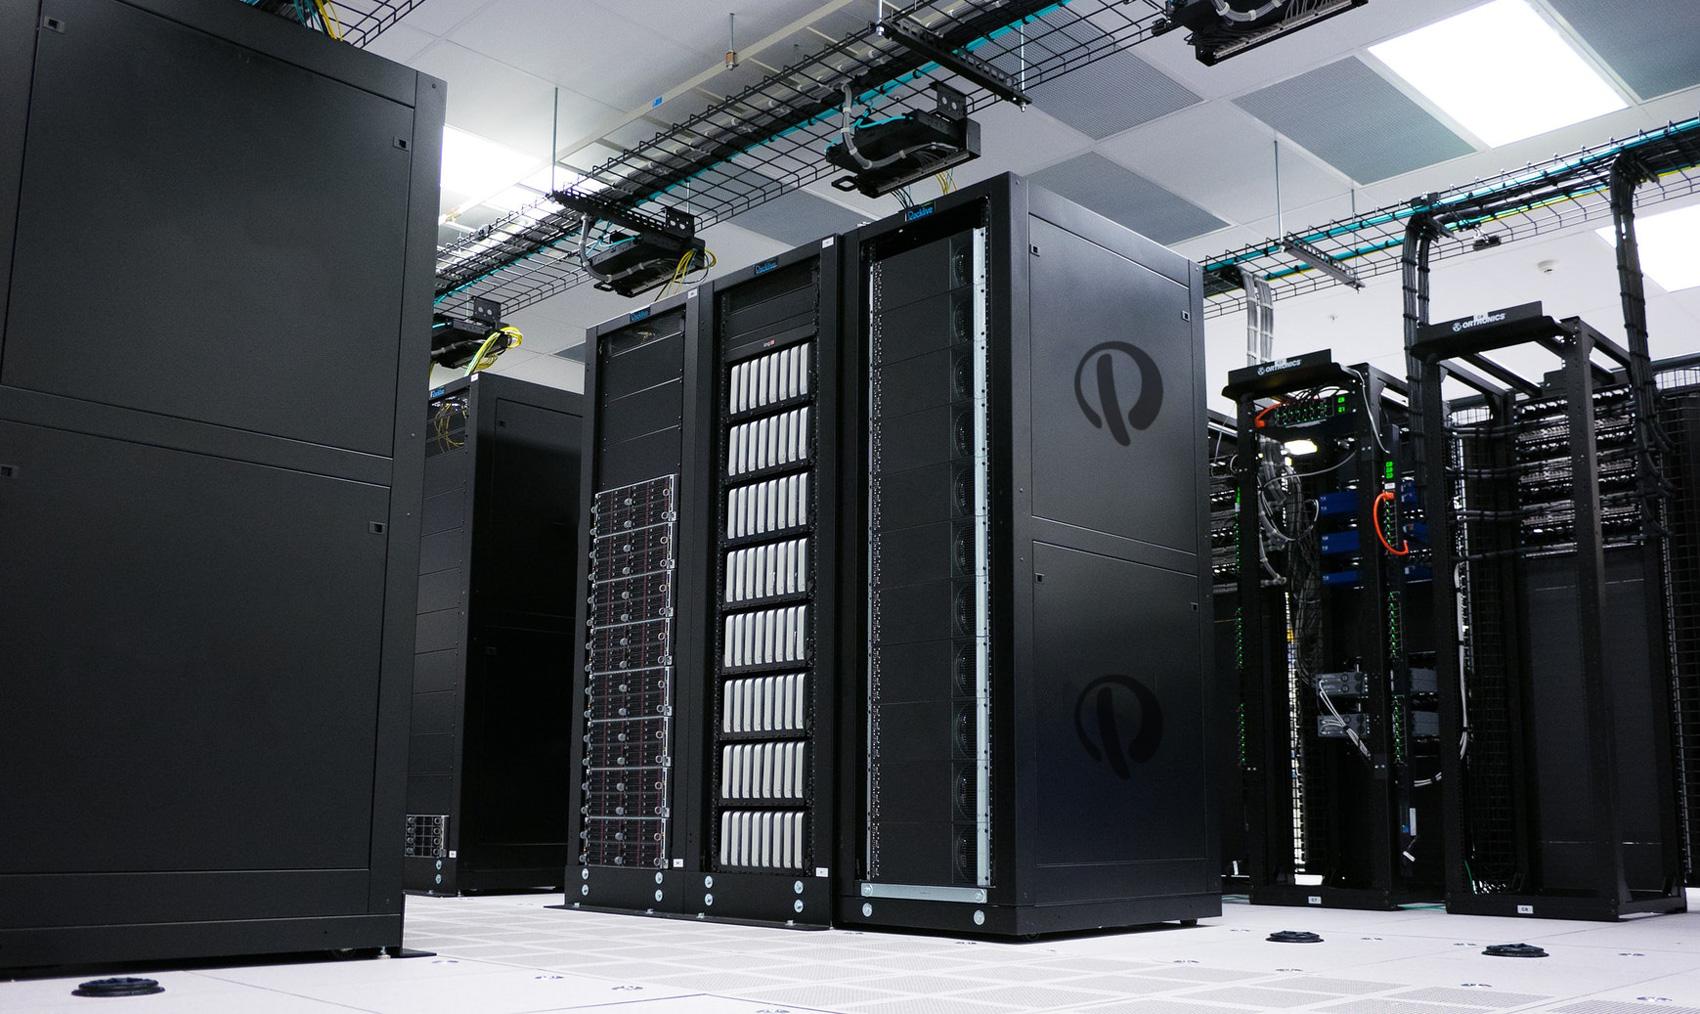 установка сервера на хостинг